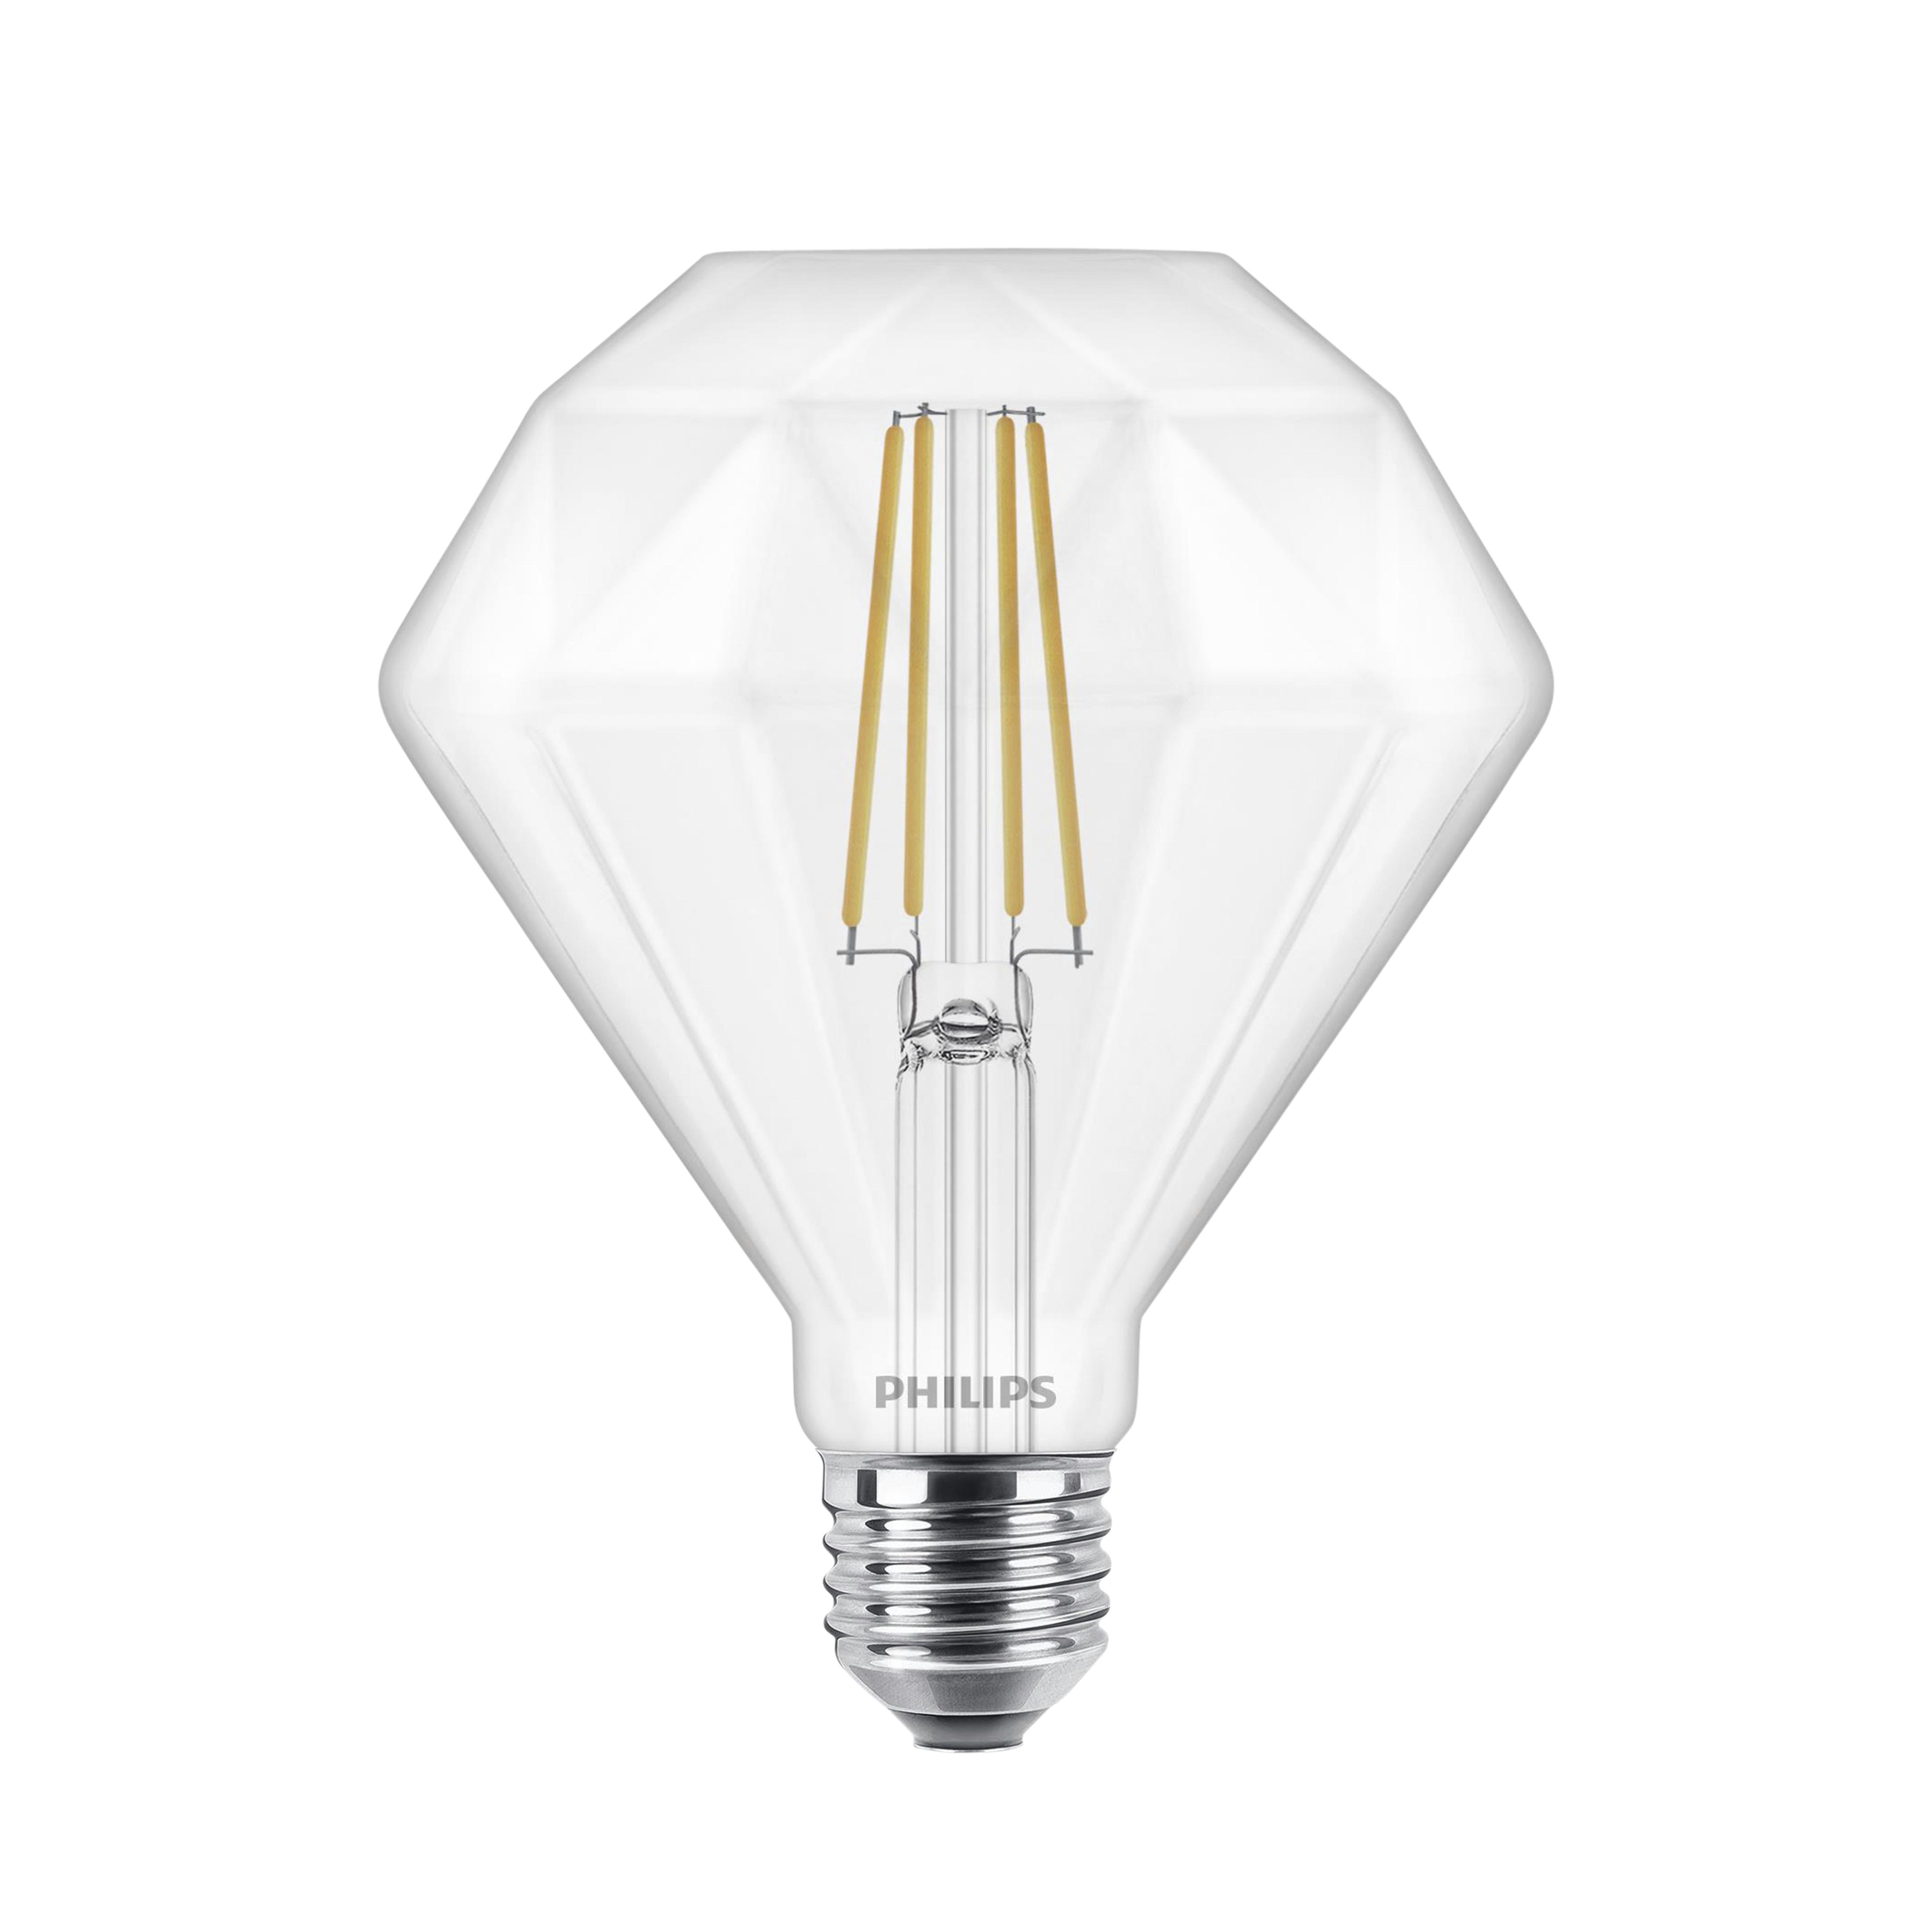 Philips LED lamp filament diamant E27 40W warm wit dimbaar